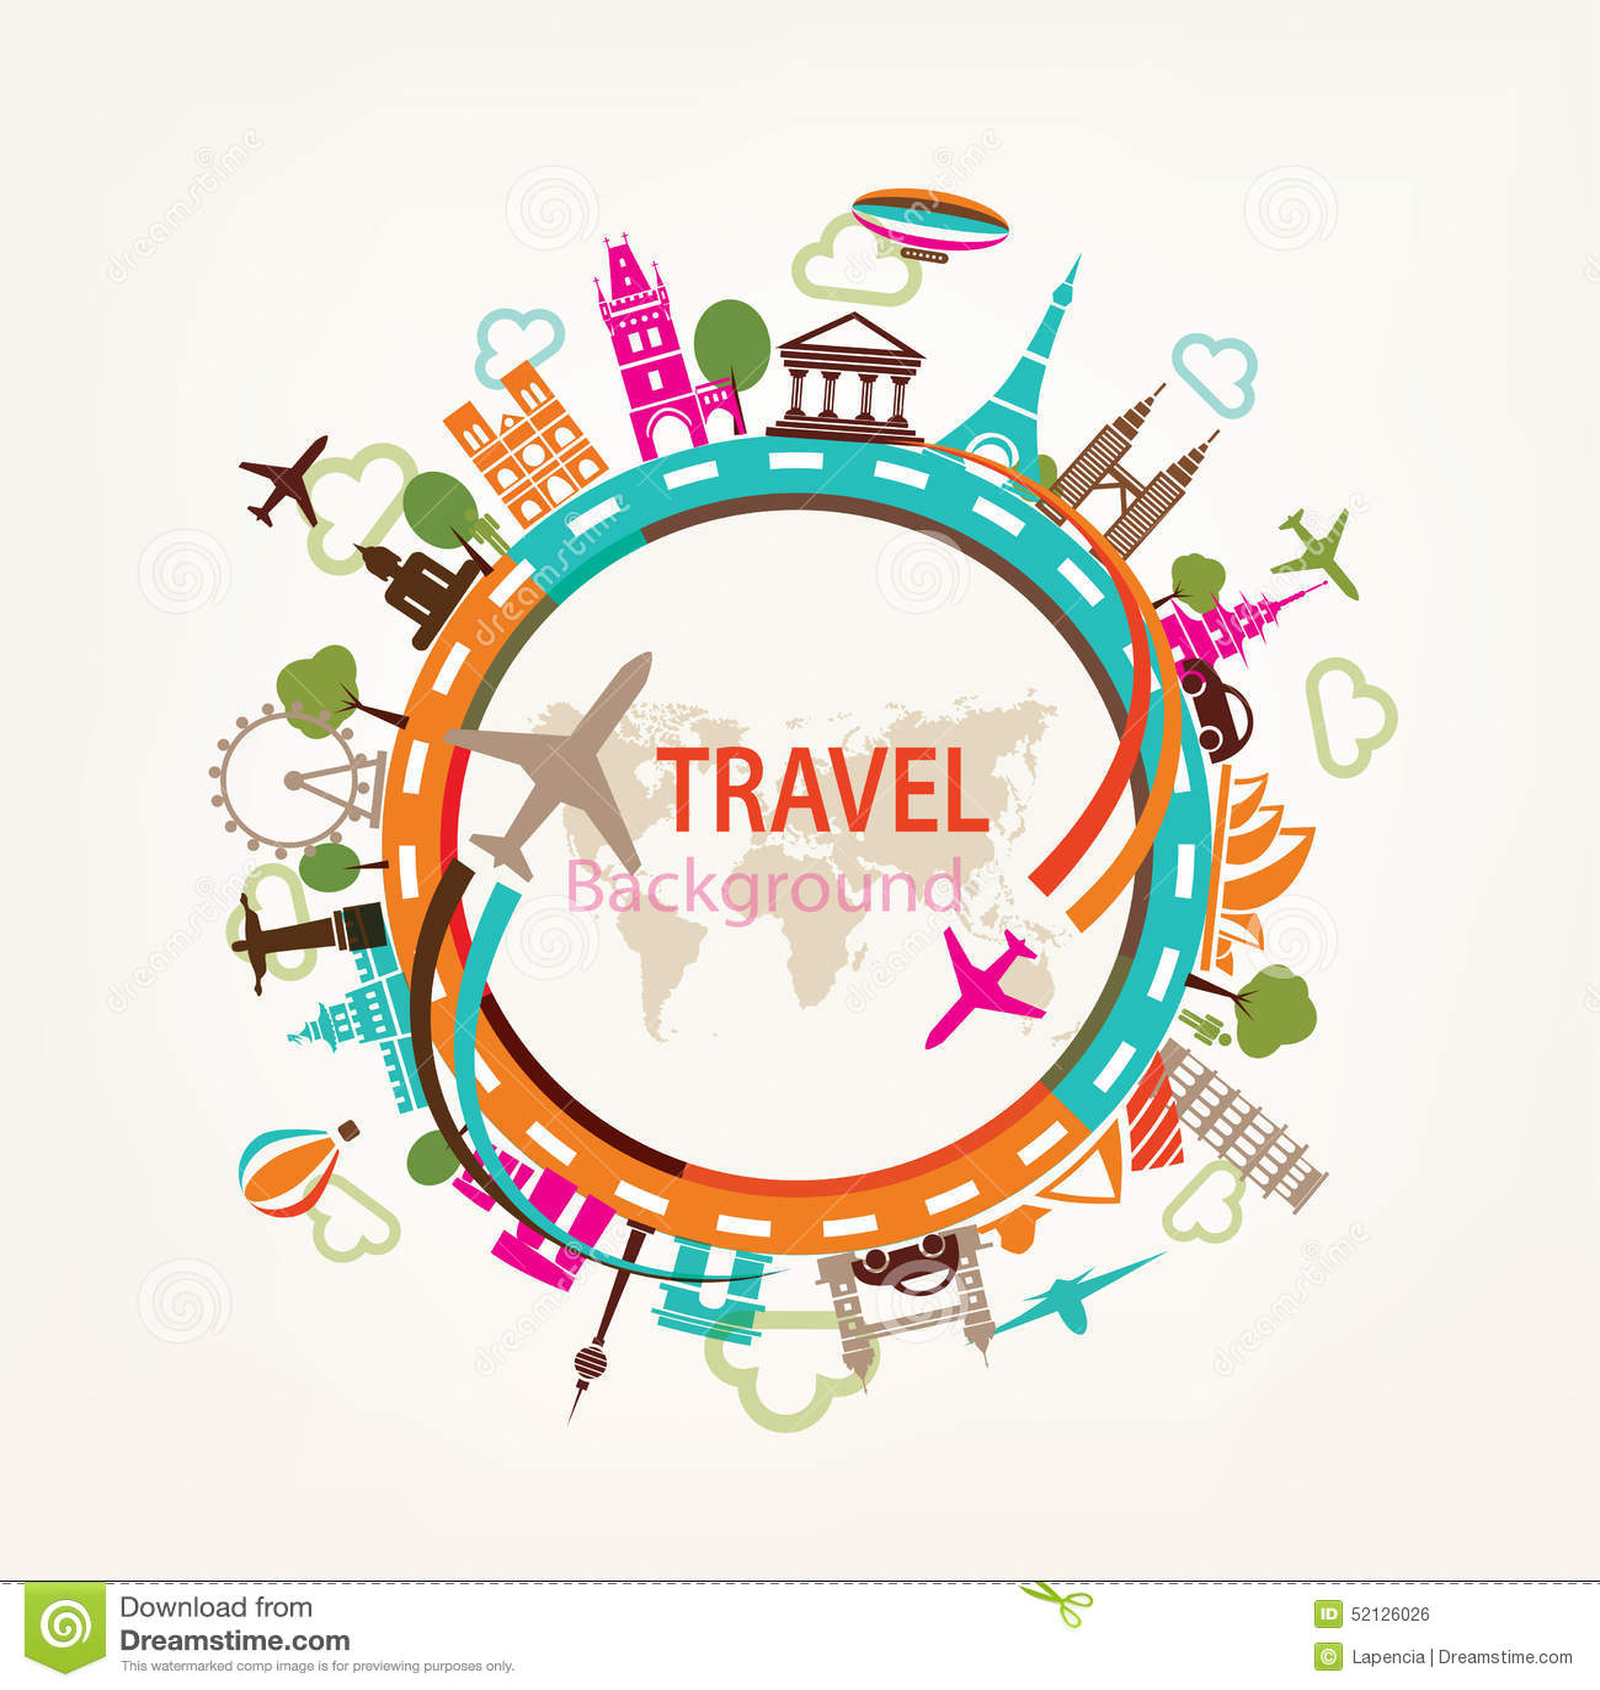 World travel, landmarks silhouettes